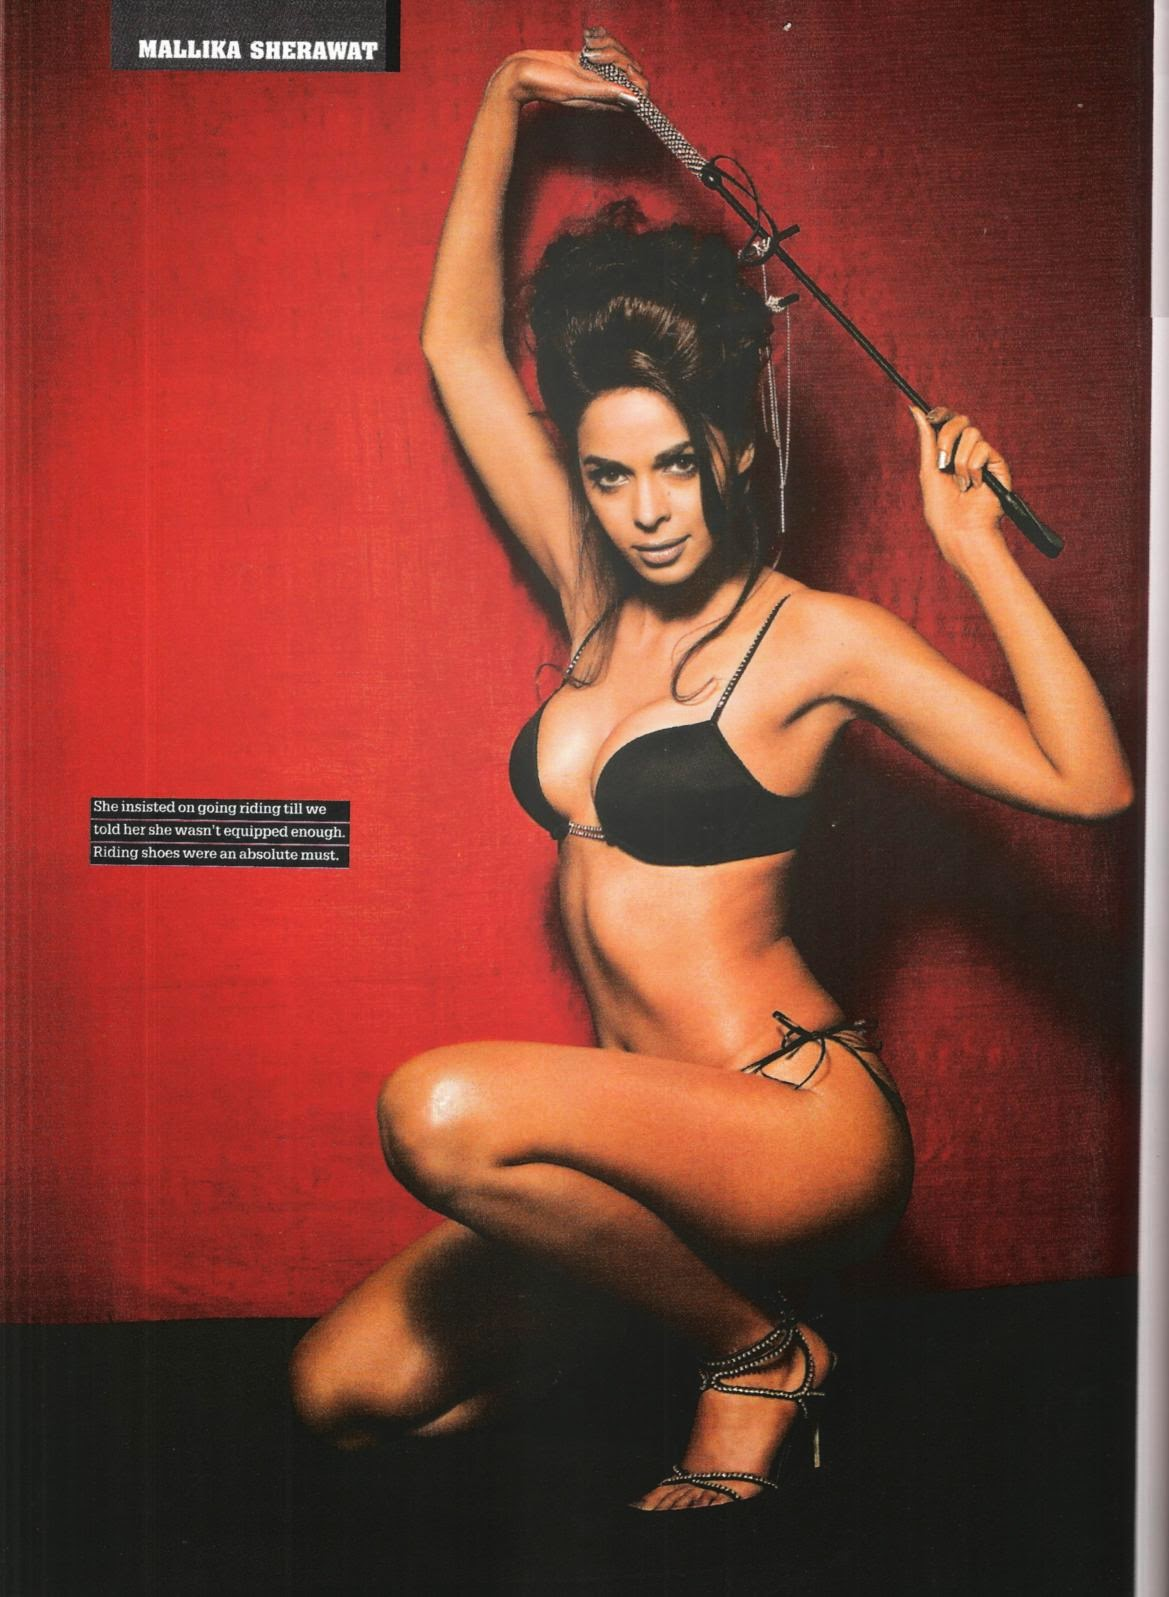 Mallika Sherawat hot naked navel kissing photos body bollywood images